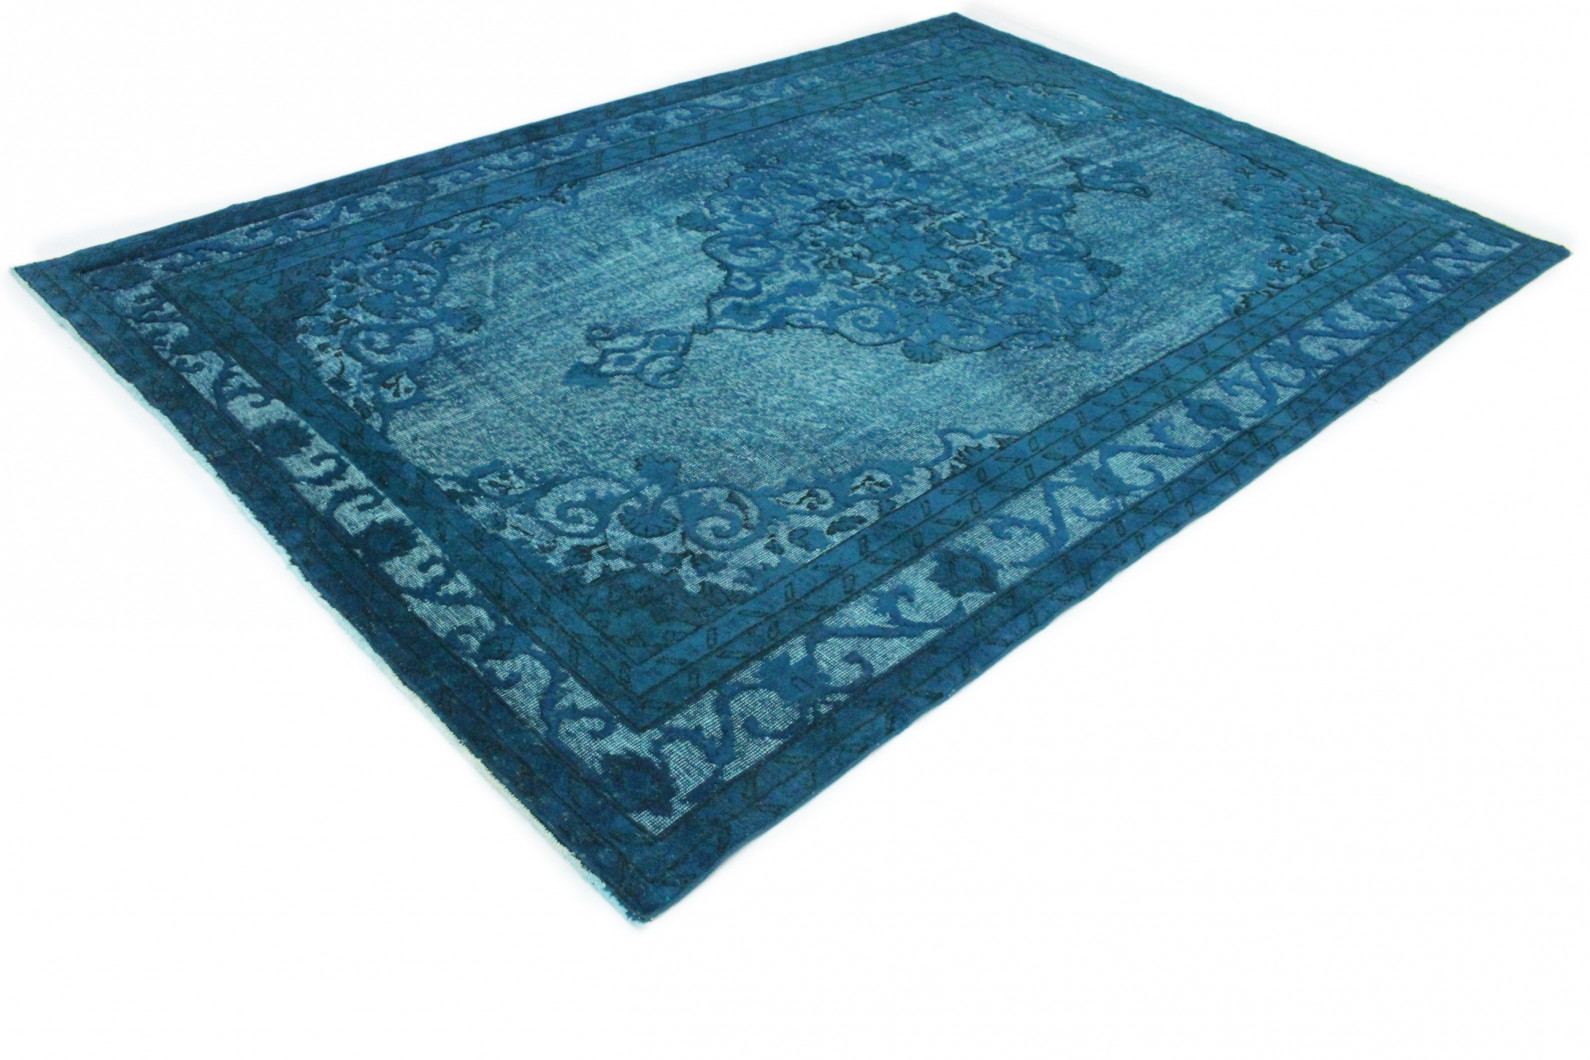 vintage teppich blau t rkis in 310x210 1011 3104 bei. Black Bedroom Furniture Sets. Home Design Ideas